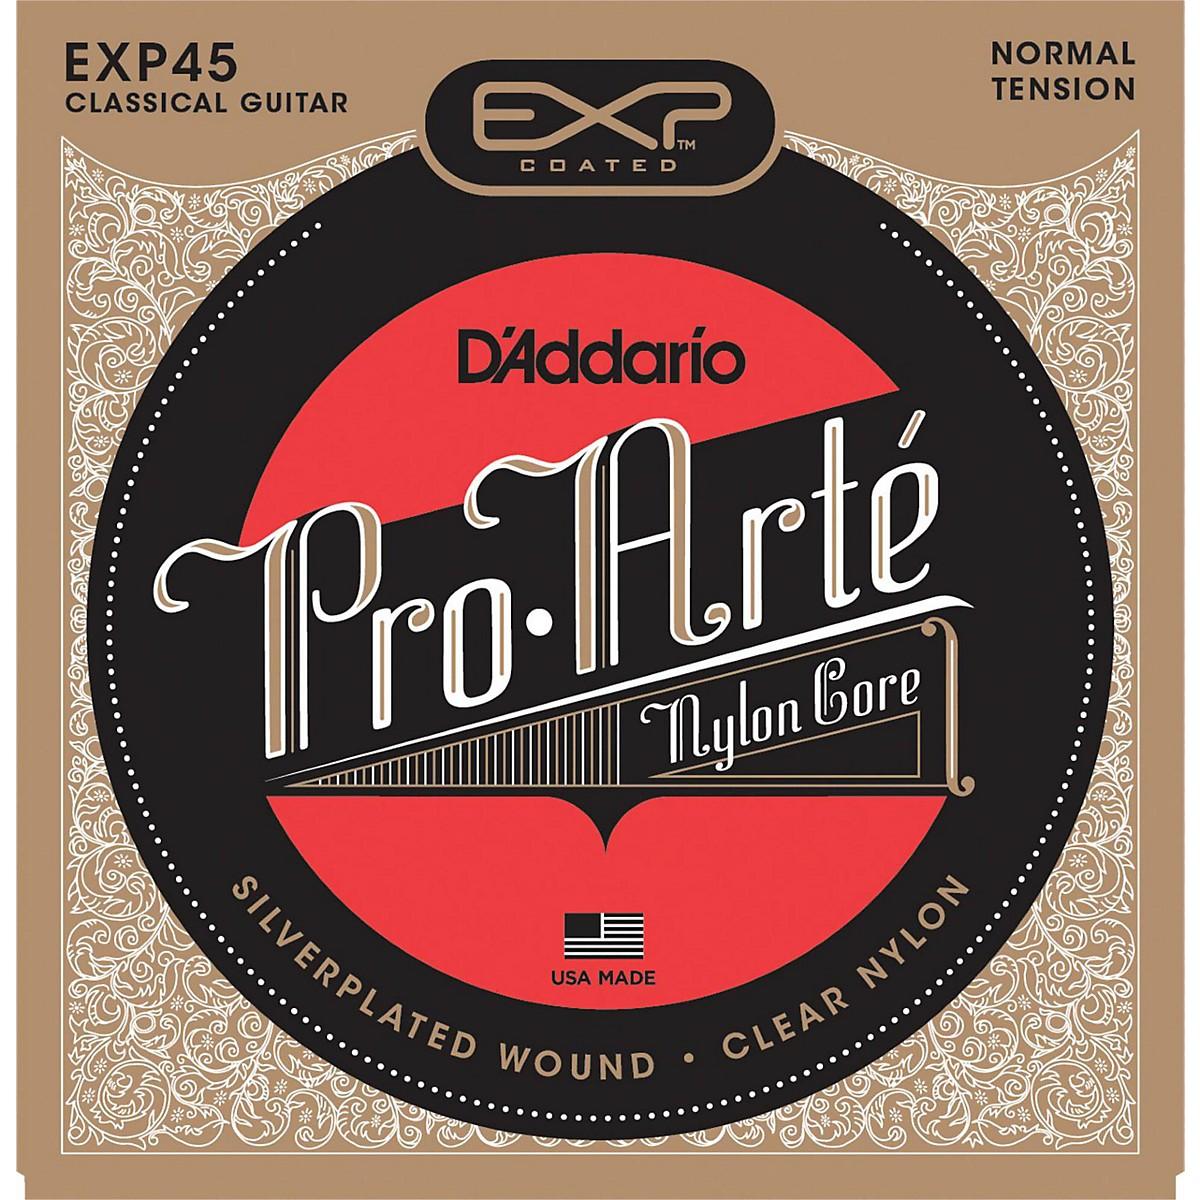 D'Addario EXP45 Coated Nylon Guitar Strings Normal Tension